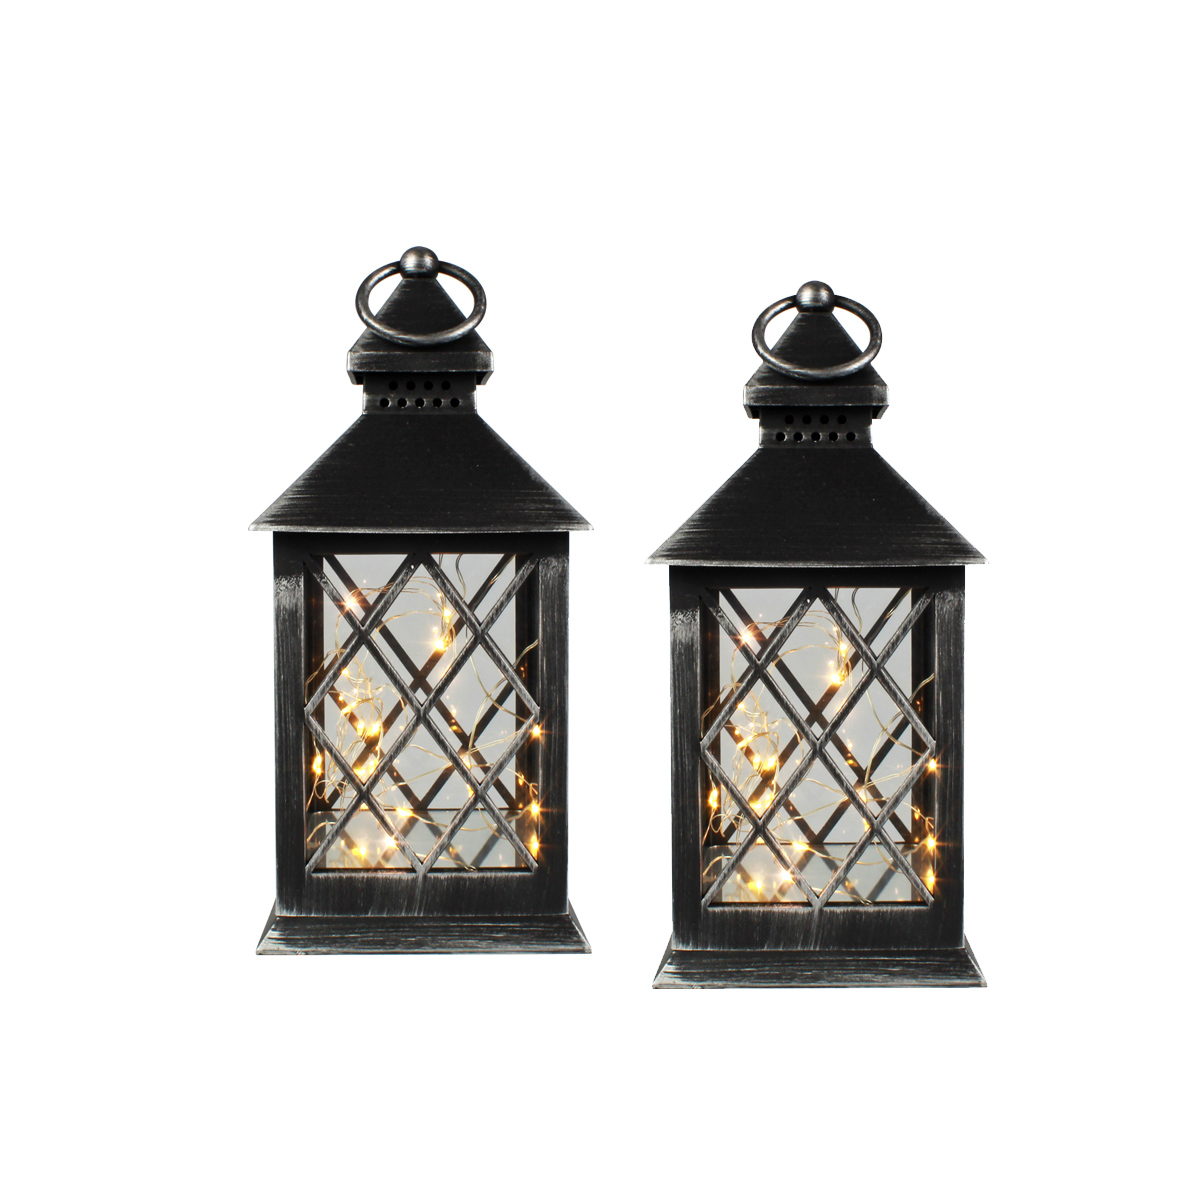 Conj. C/ 2 Lanternas Marroquinas Decorativas LED Pretas 27cm Verito